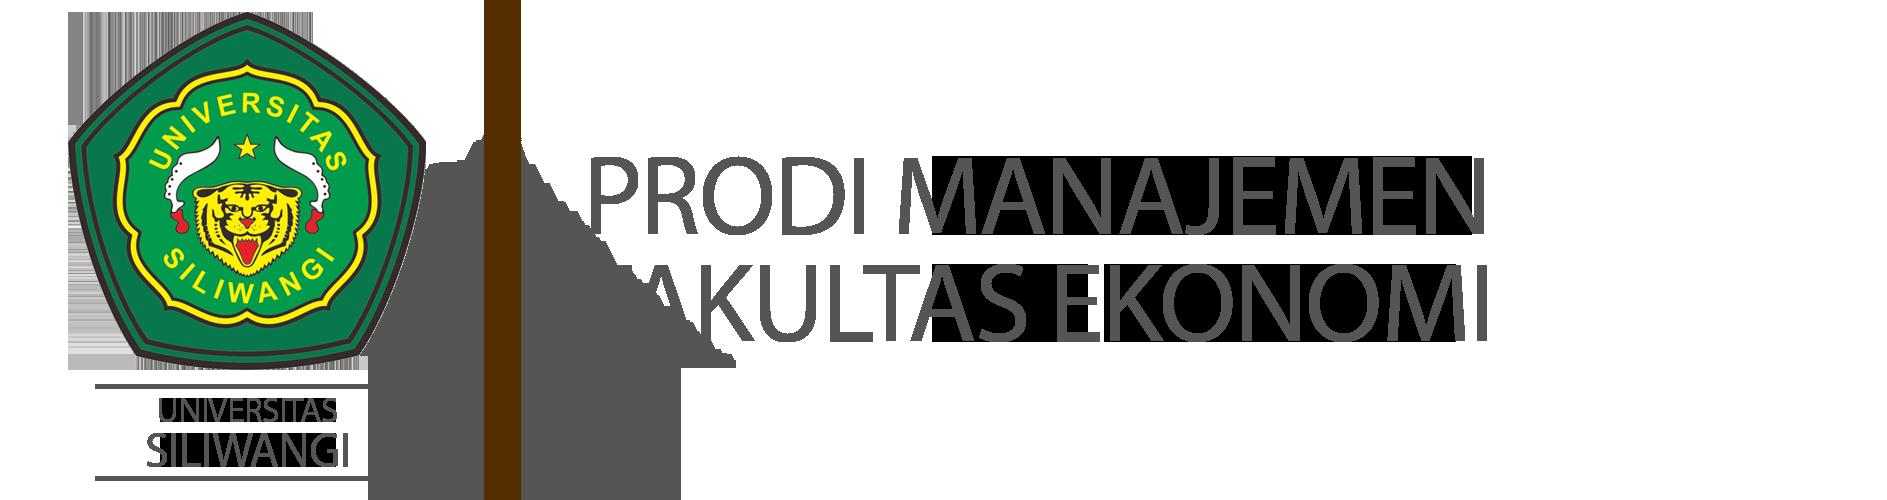 Website Resmi Prodi Ekonomi Manajemen Universitas Siliwangi